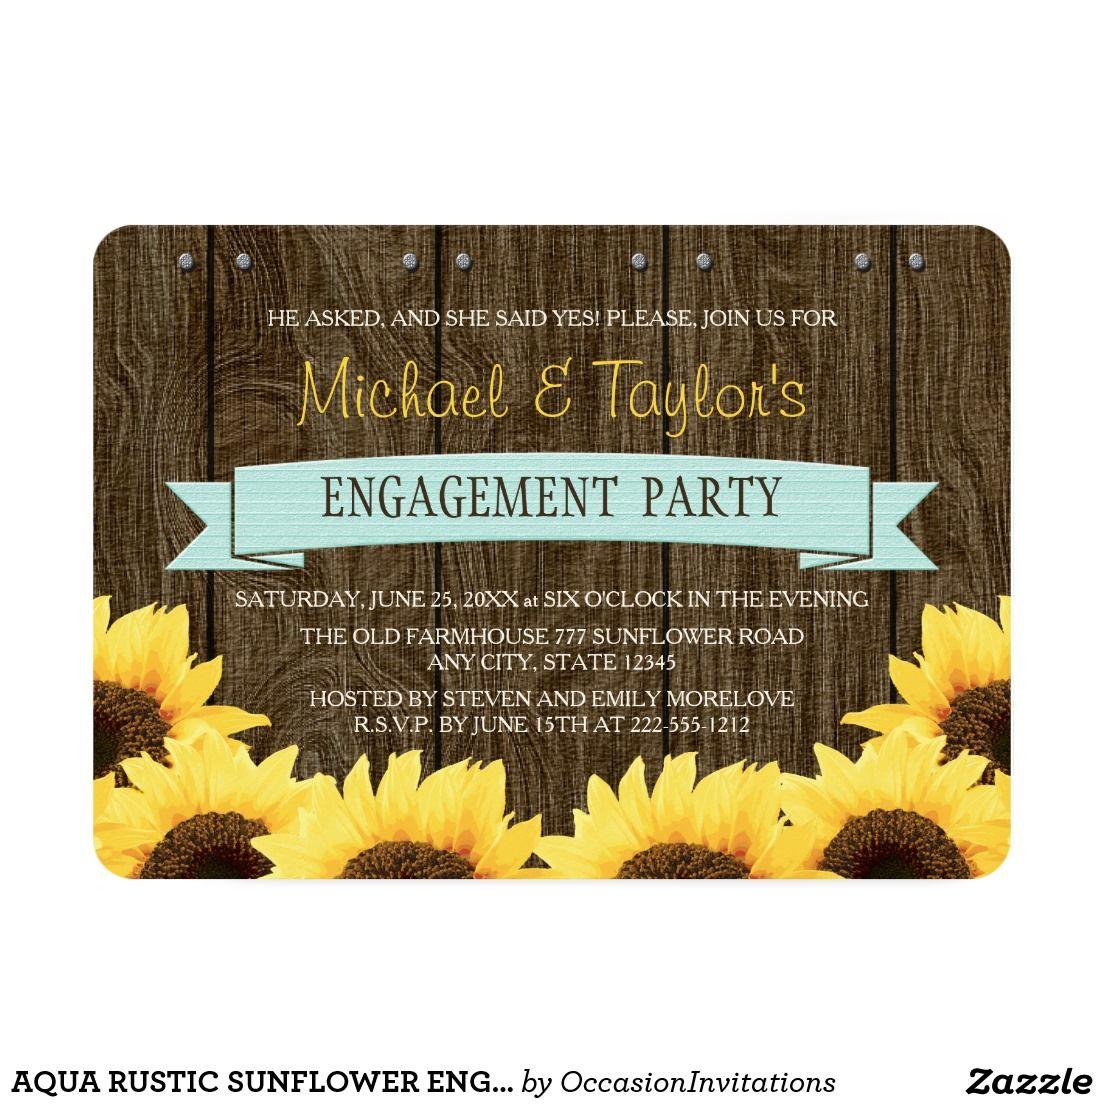 AQUA RUSTIC SUNFLOWER ENGAGEMENT PARTY CARD | Wedding :Engagement ...